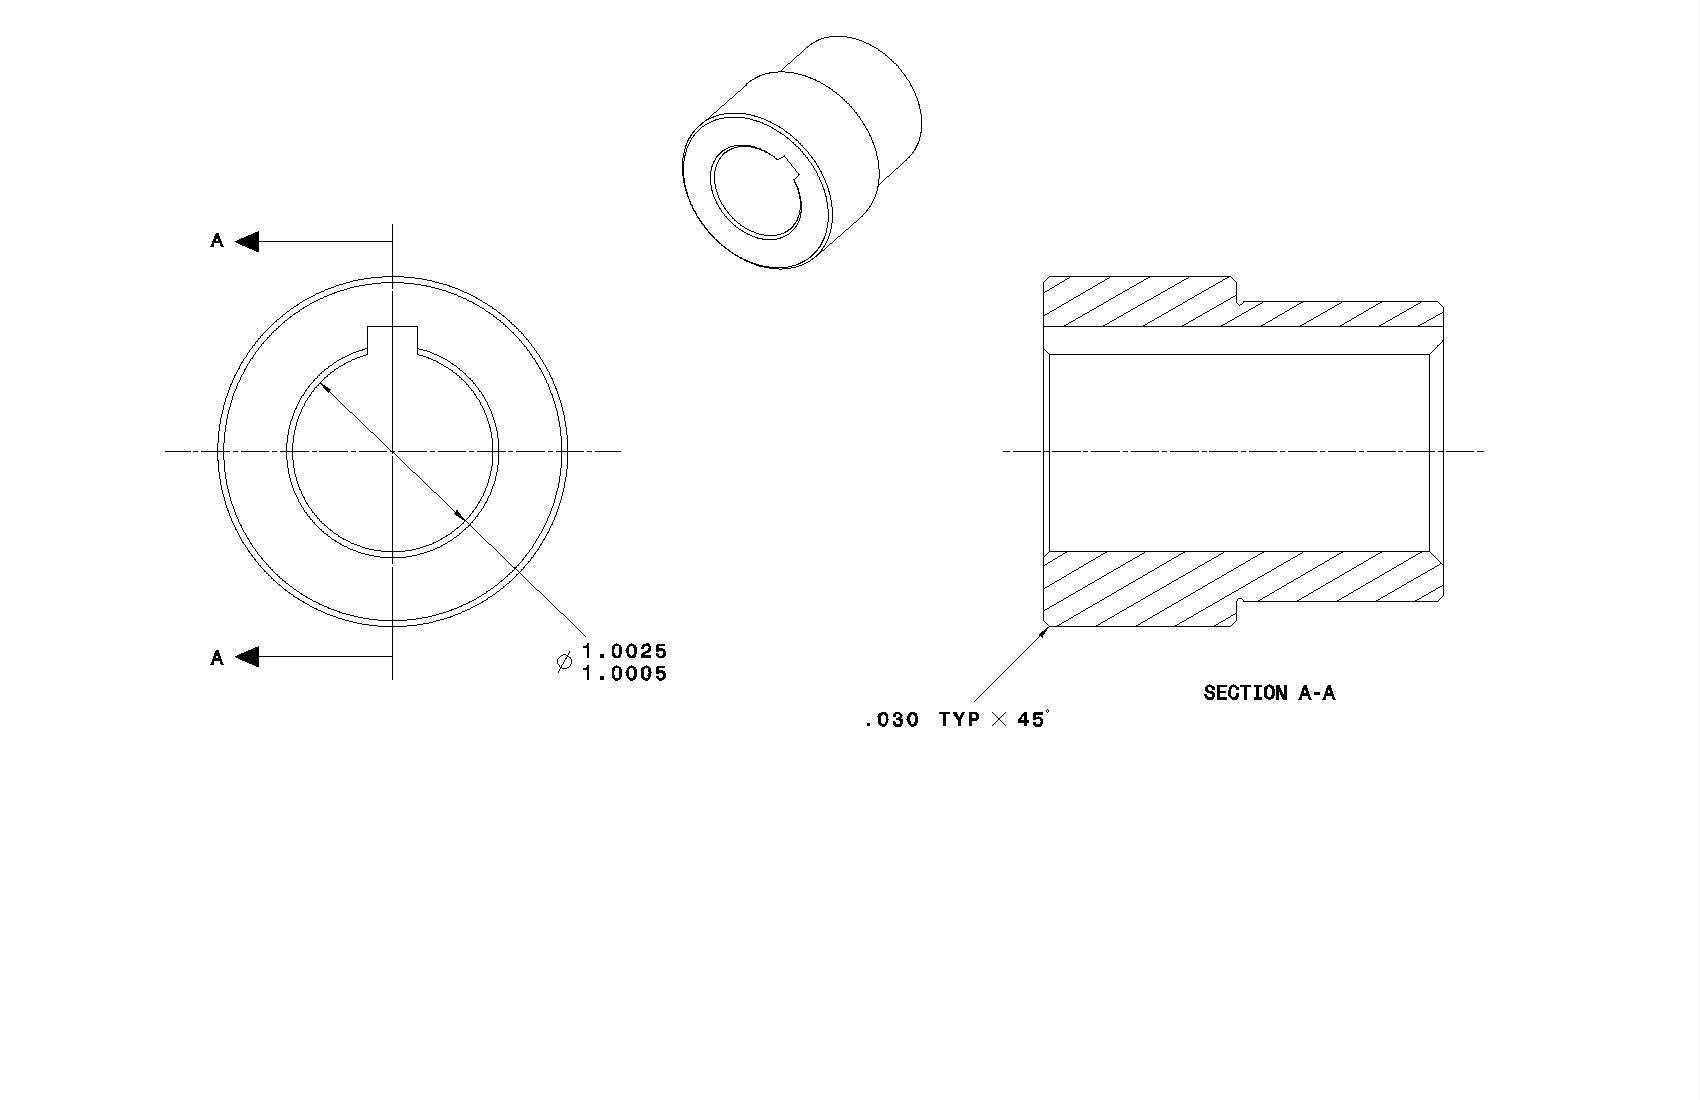 CAD软件技术v图纸交流区图纸标注我们的倒角弱电cad图纸免费下载图片